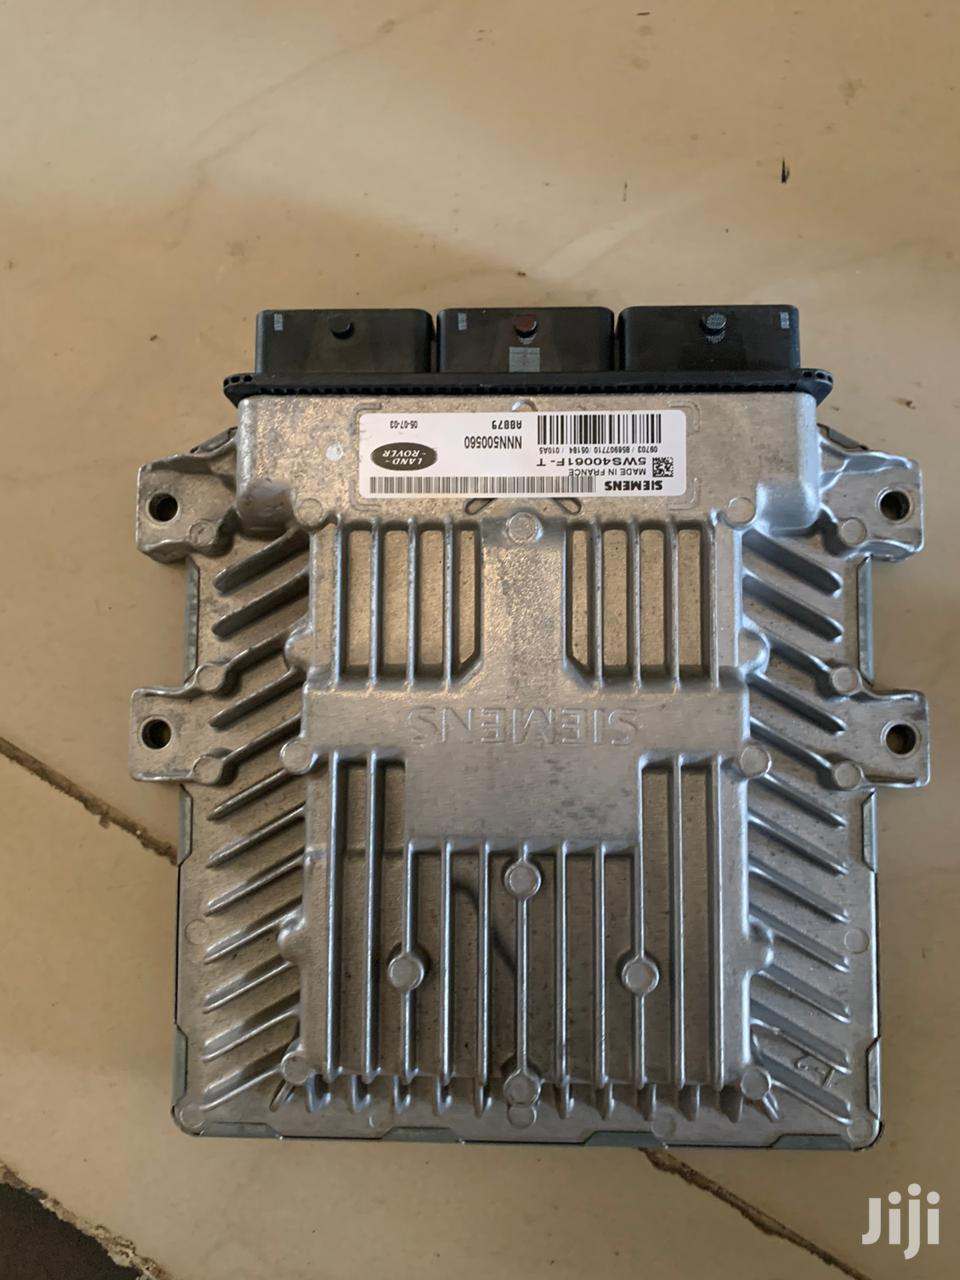 Discovery 3 Tdv6 Ignition Lock Set Barrel Key Ecu Nnn 50075 | Vehicle Parts & Accessories for sale in Ngara, Nairobi, Kenya